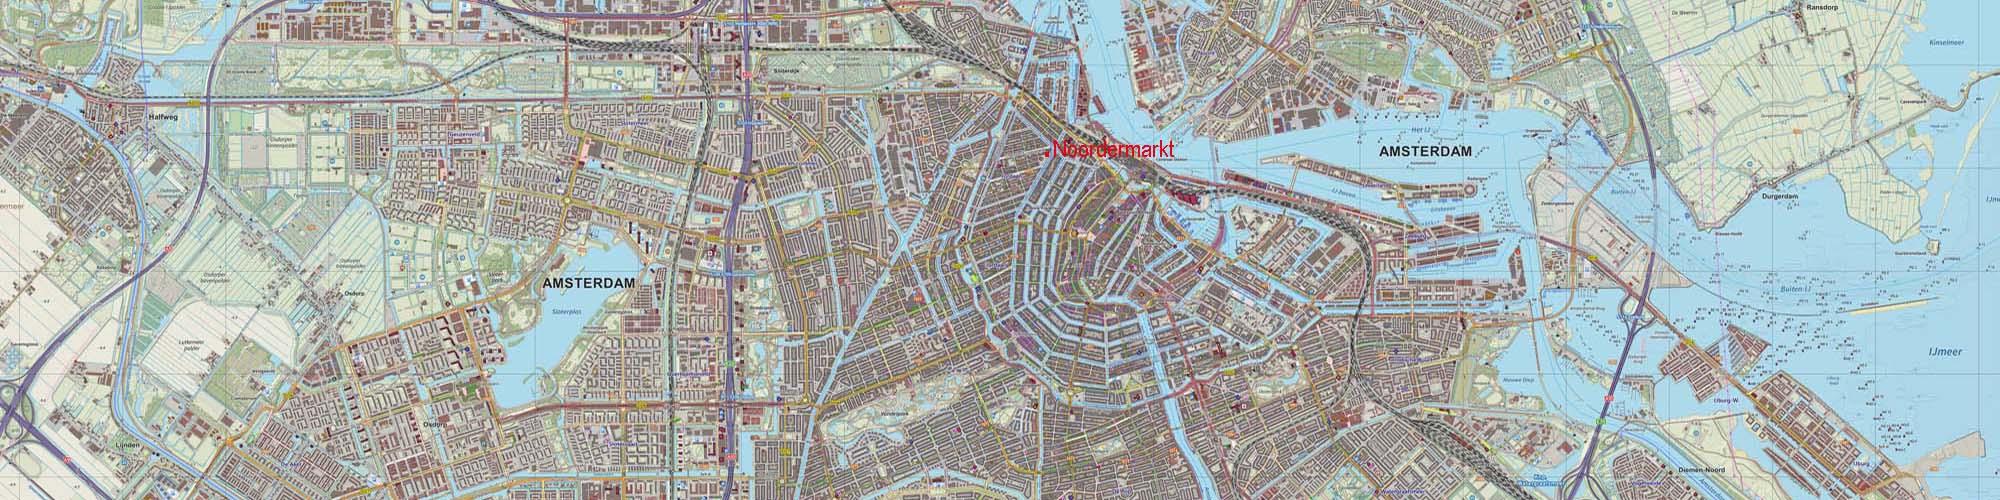 https://www.noordermarkt-amsterdam.nl/uploads/images/fotostroke/Route-1.jpg